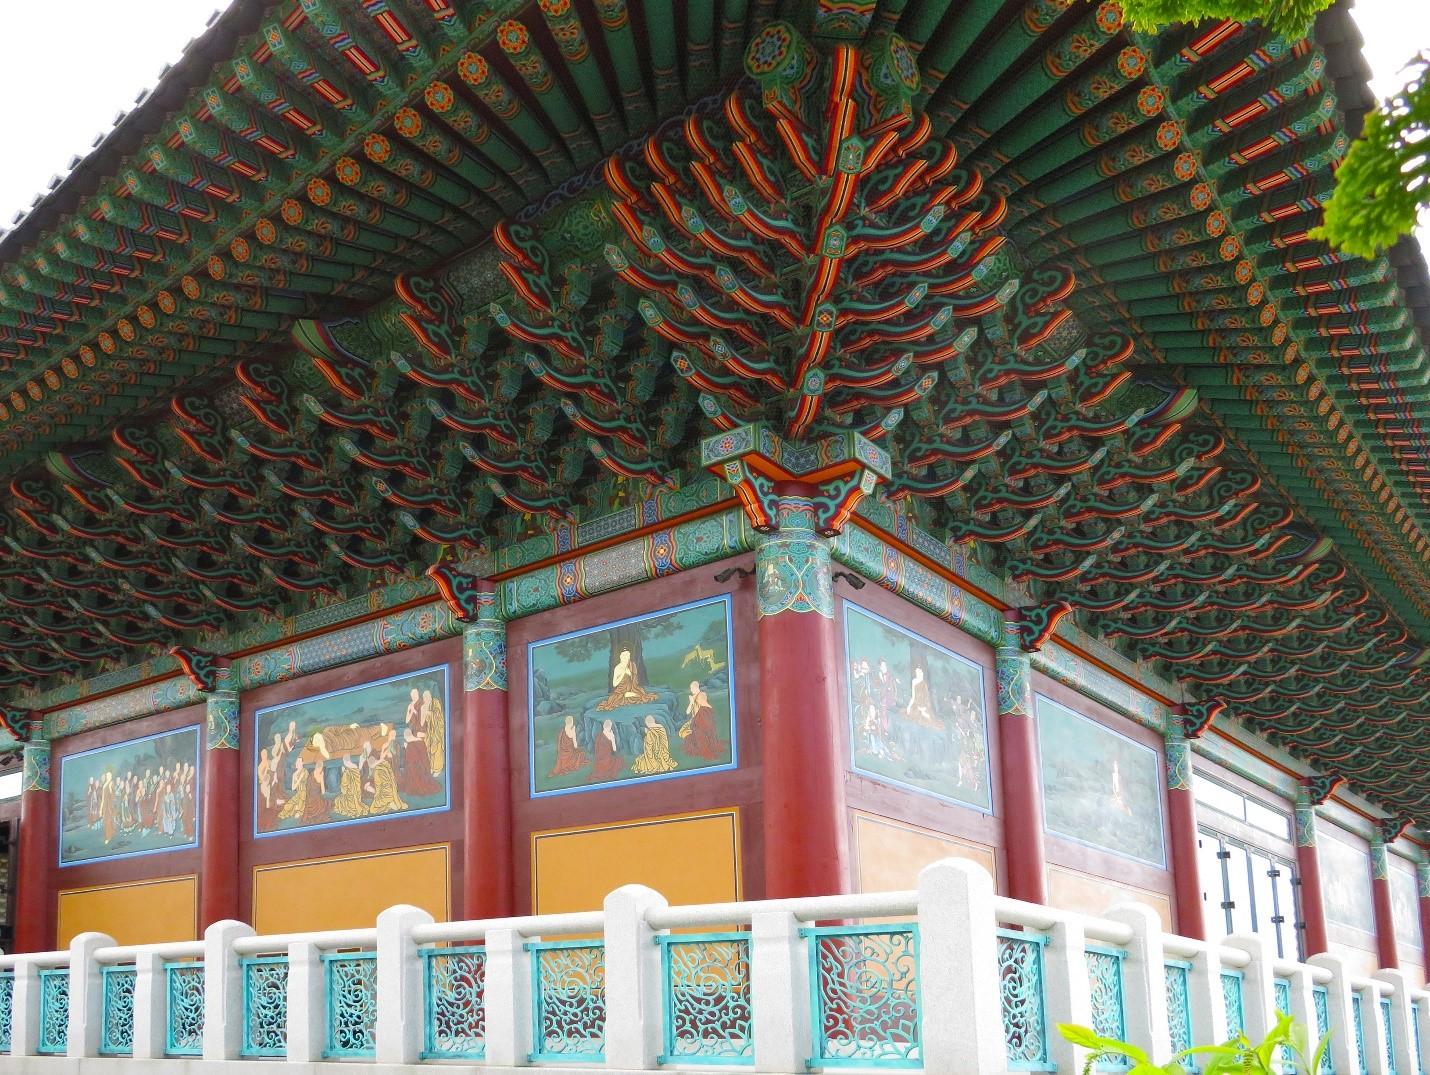 Han Ma Um Zen Center of New York in Flushing won the award for best new constructions among religious buildings.